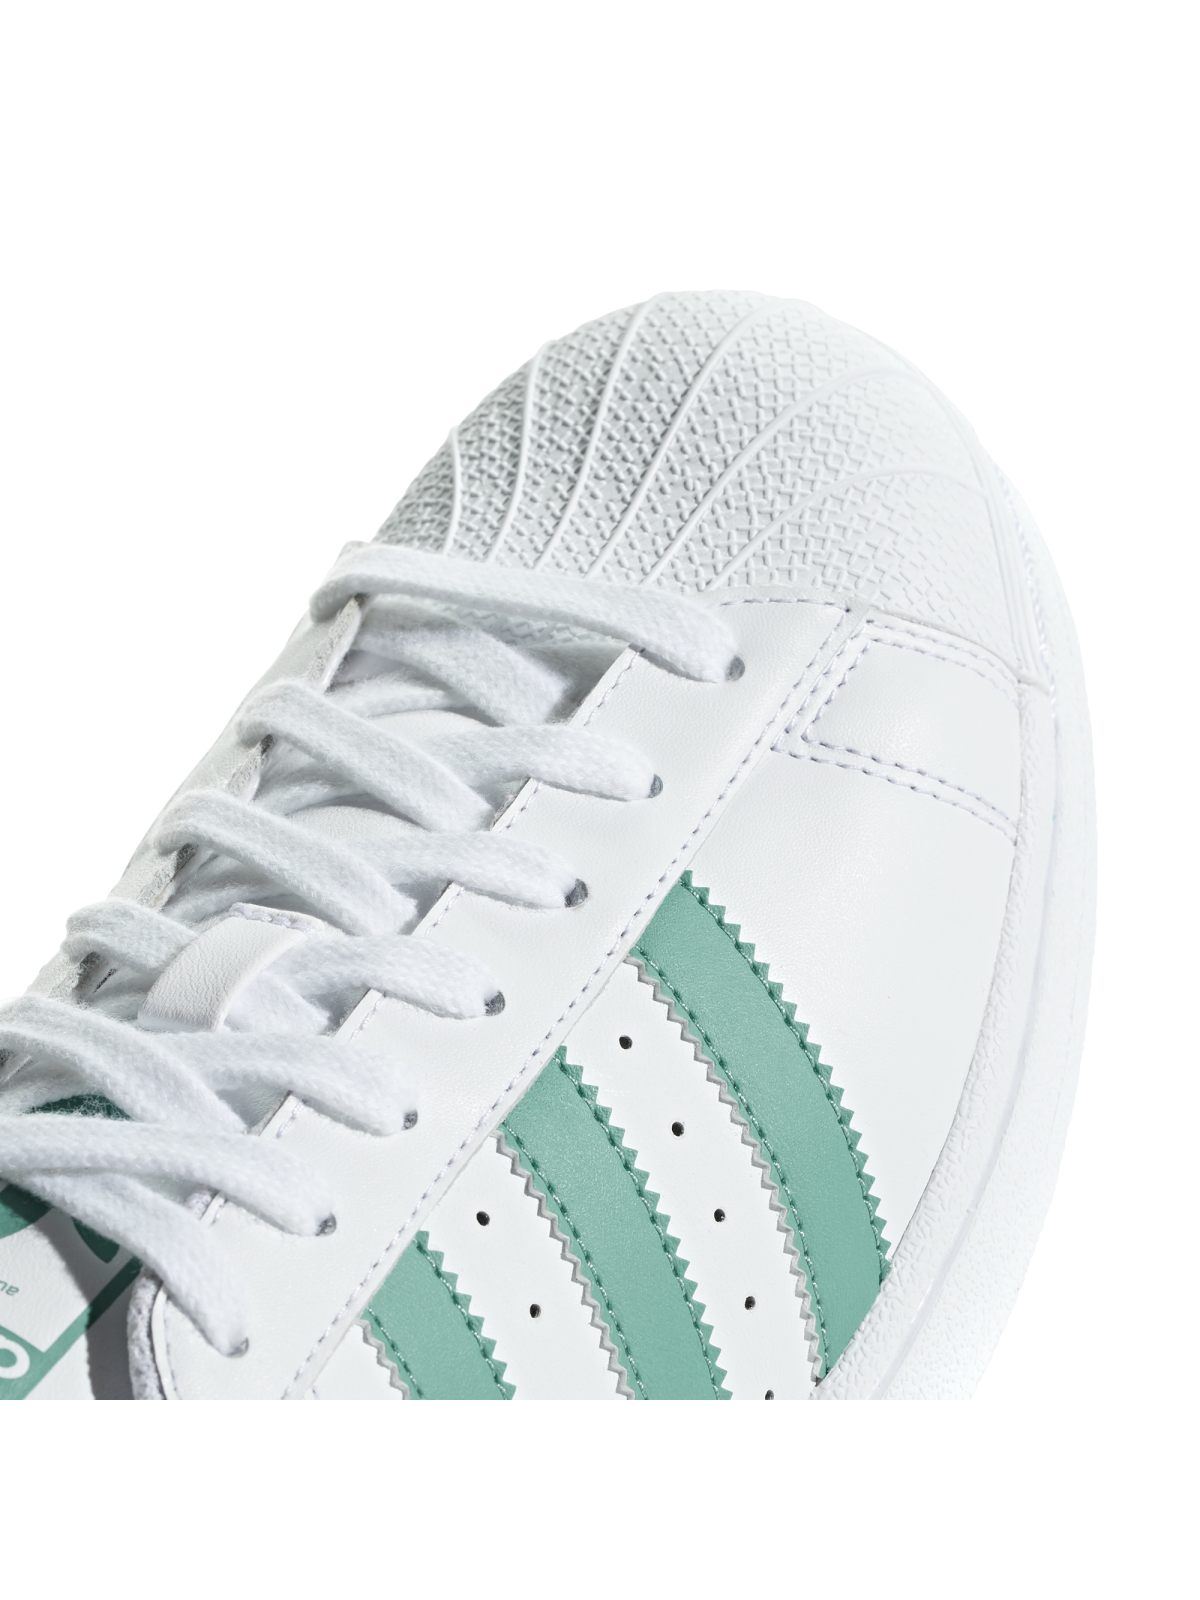 Adidas Superstar cuir blanc vert billard